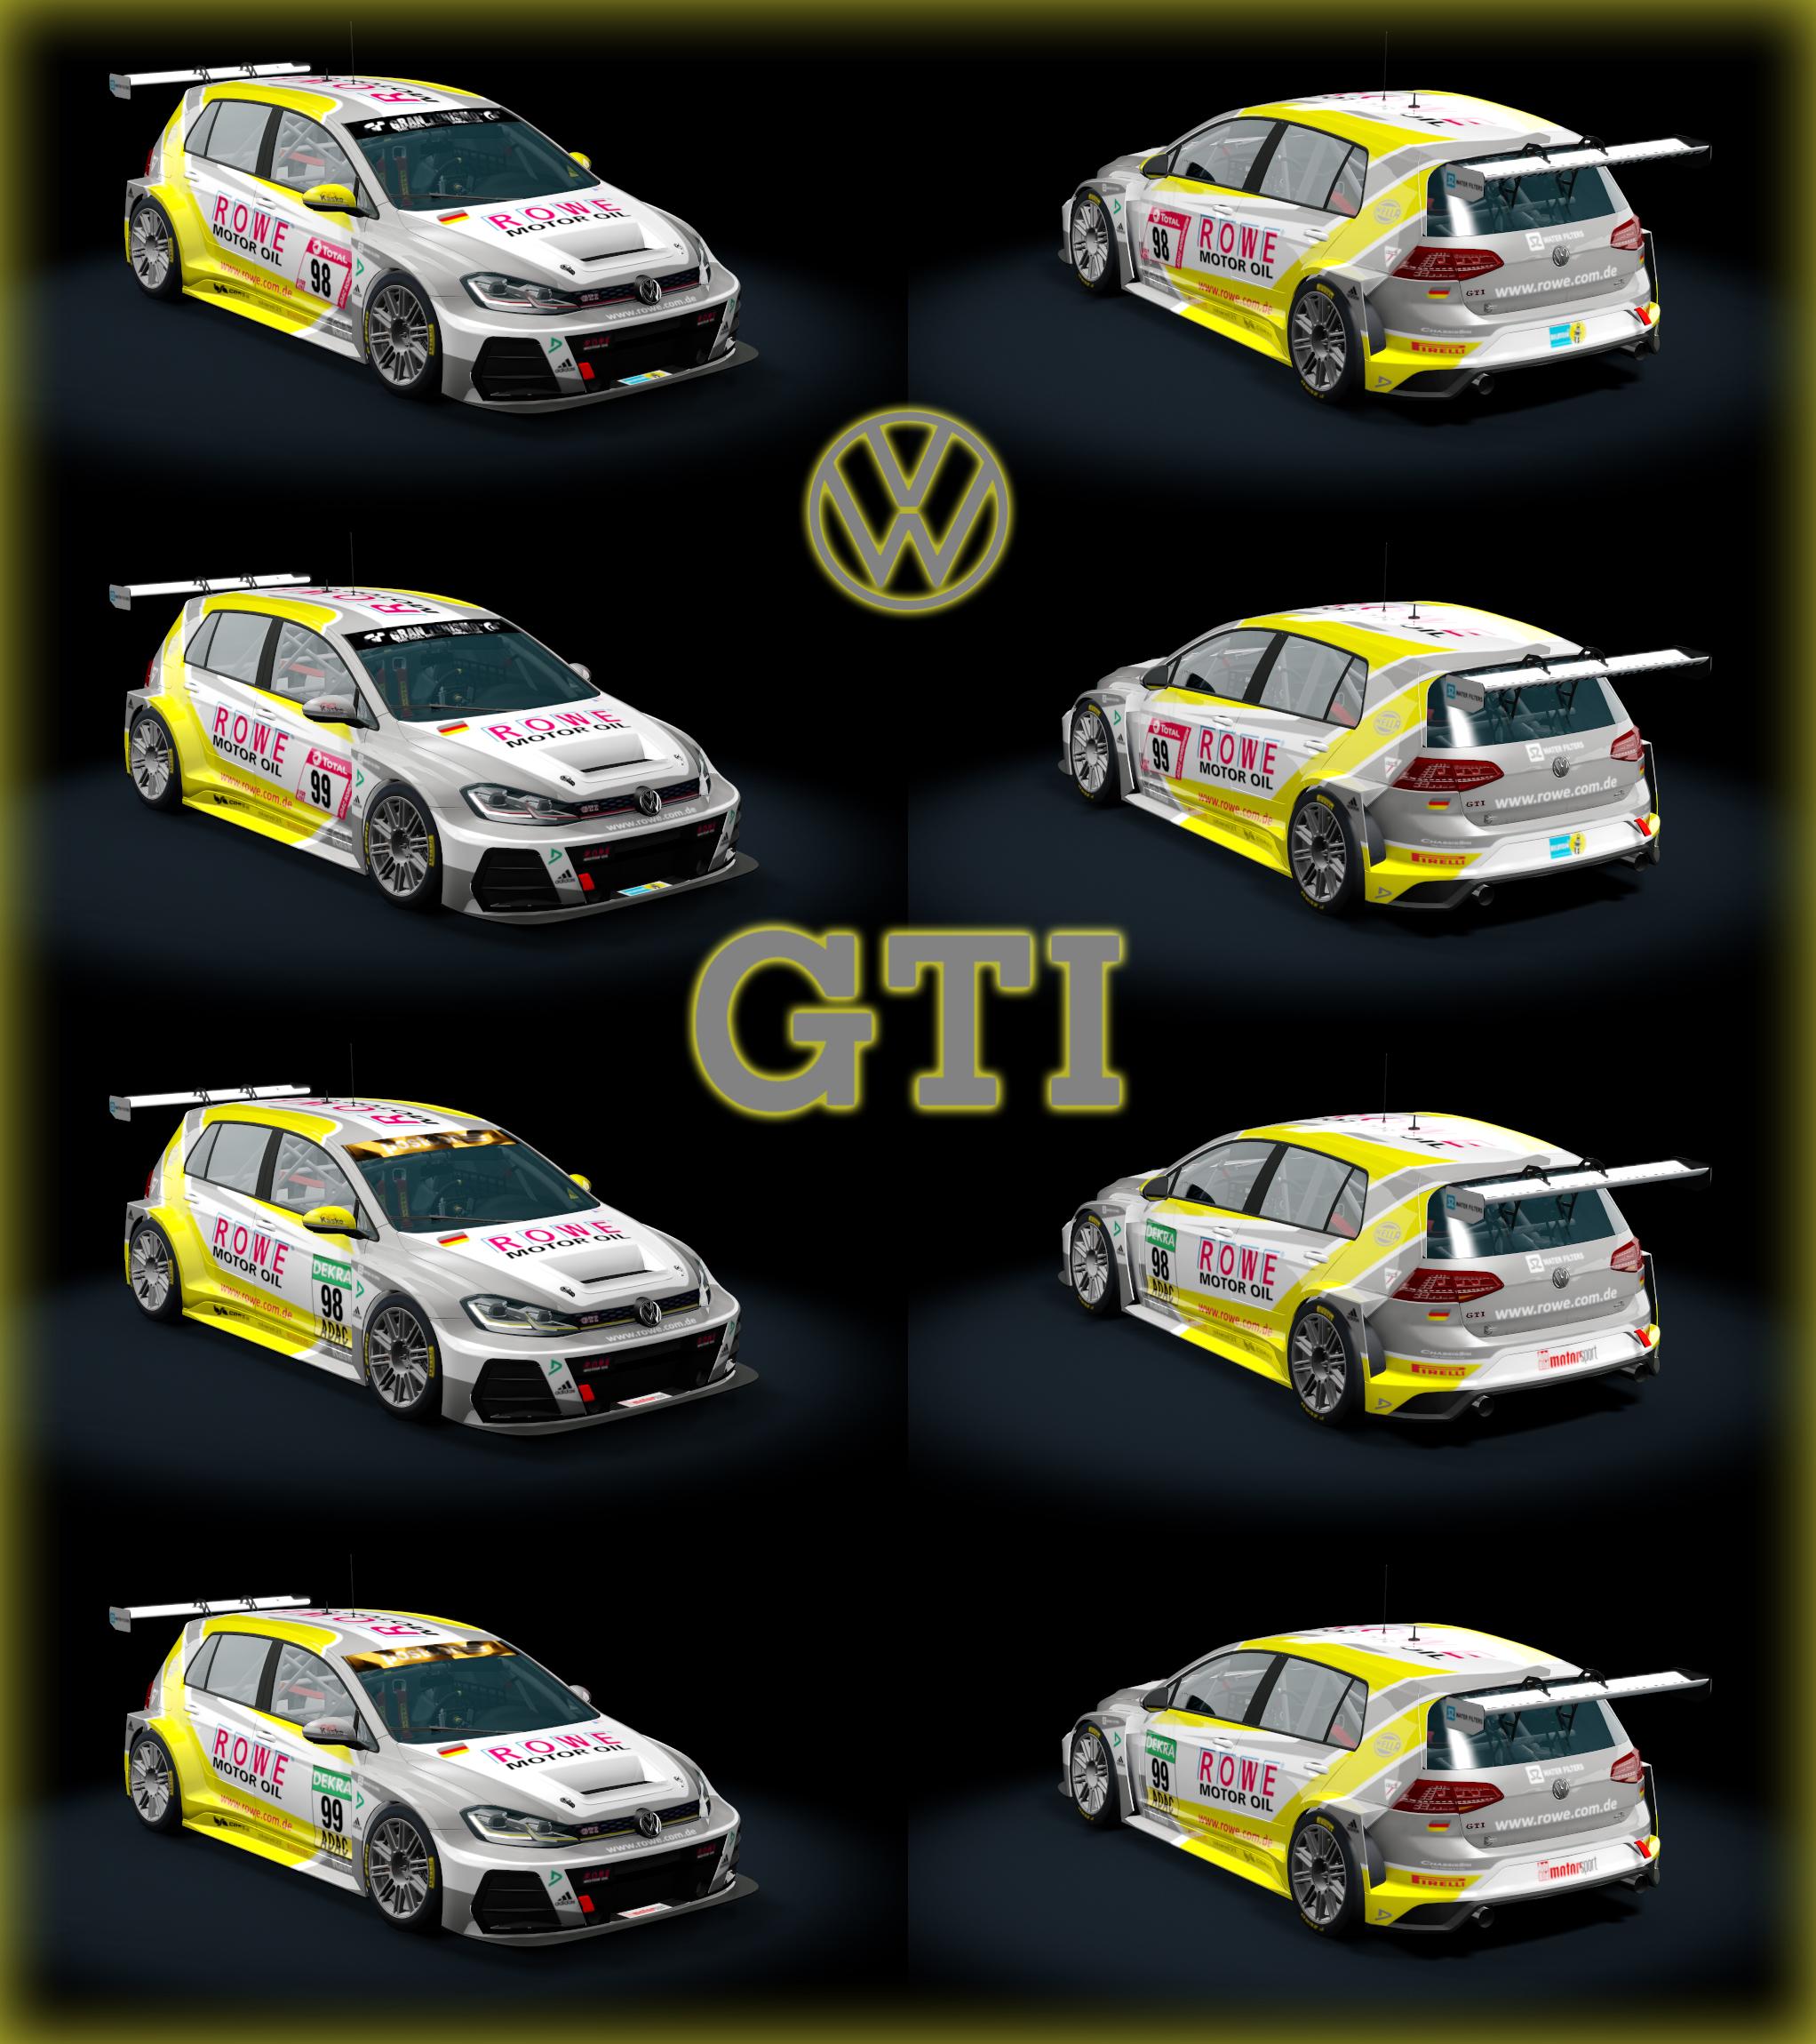 WTCR Golf GTI Rowe Racing.jpg